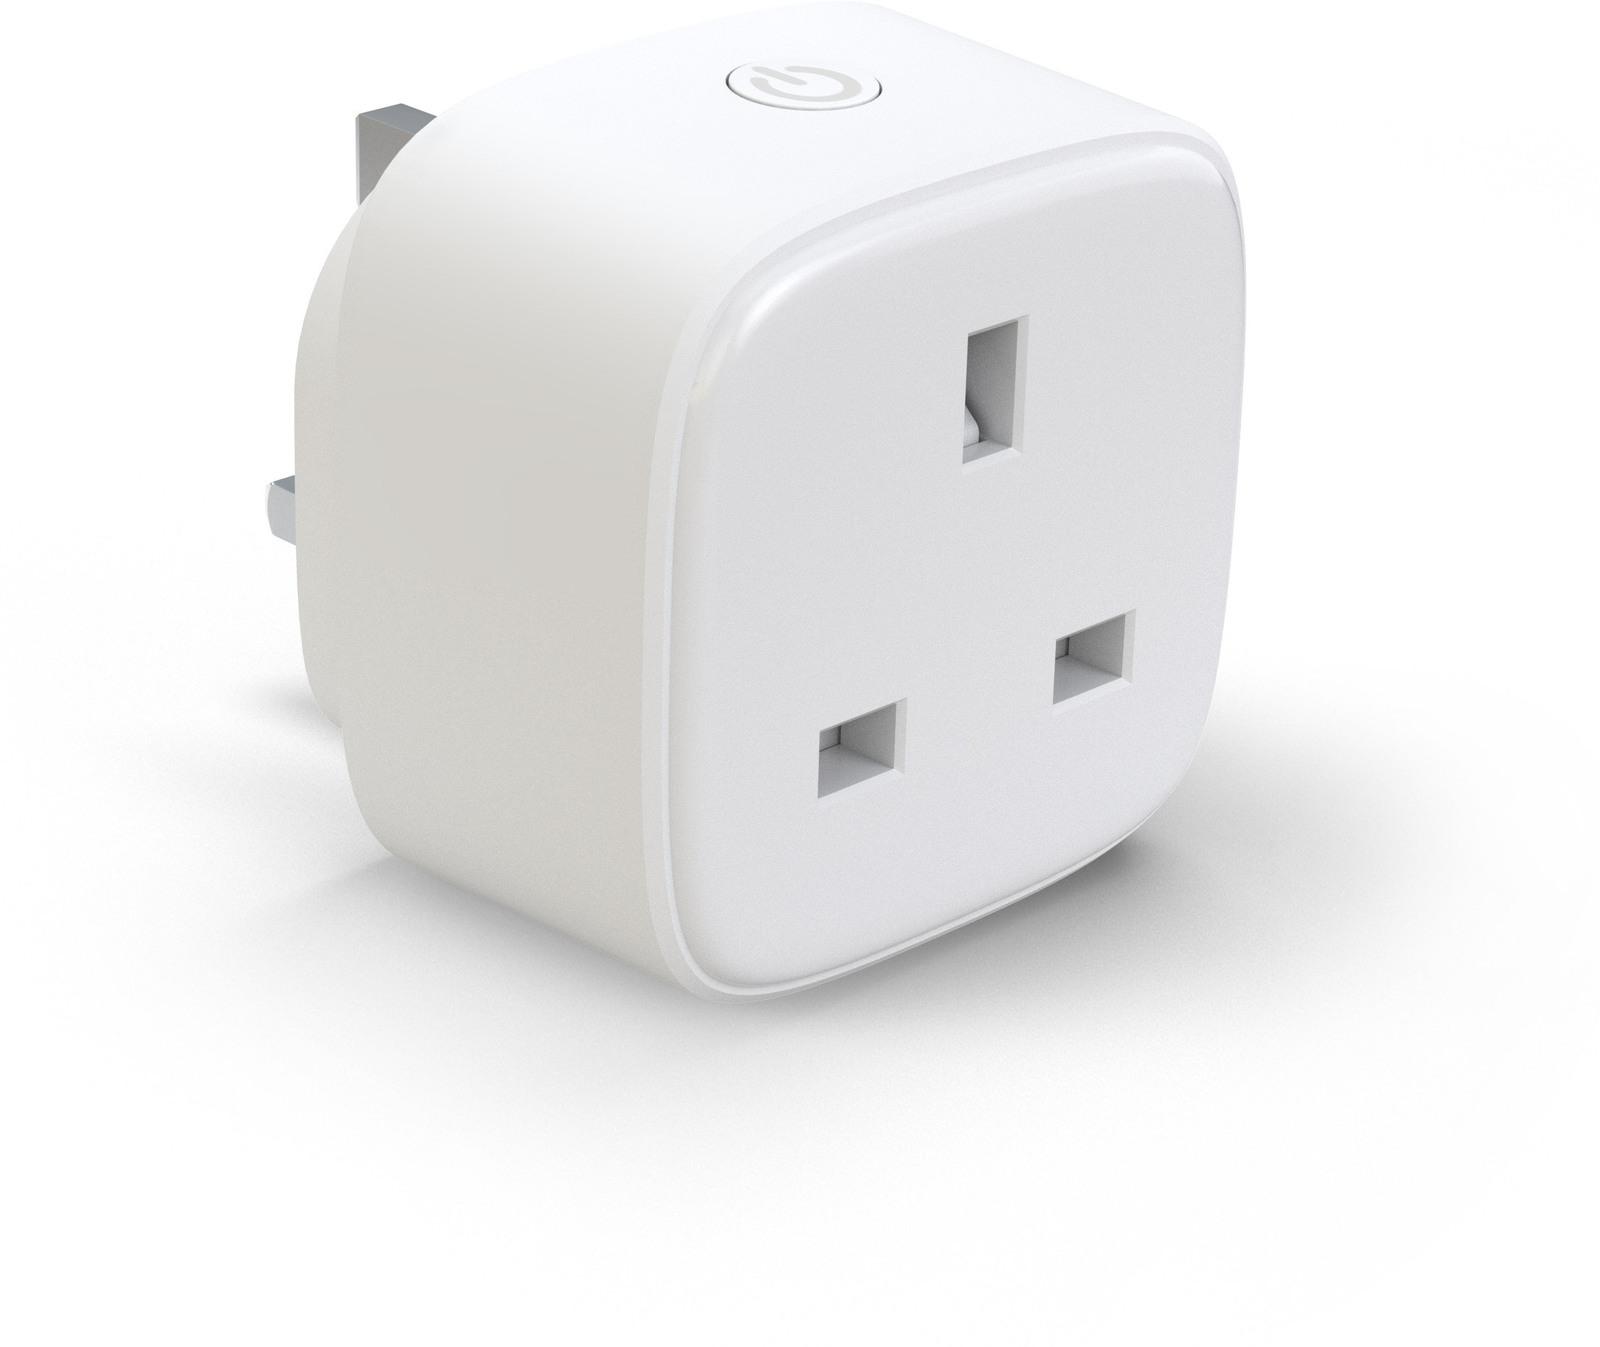 INNR Lighting 1x ZigBee3.0 Smart Plug Small footprint, on/off, UK SP 222 - eet01